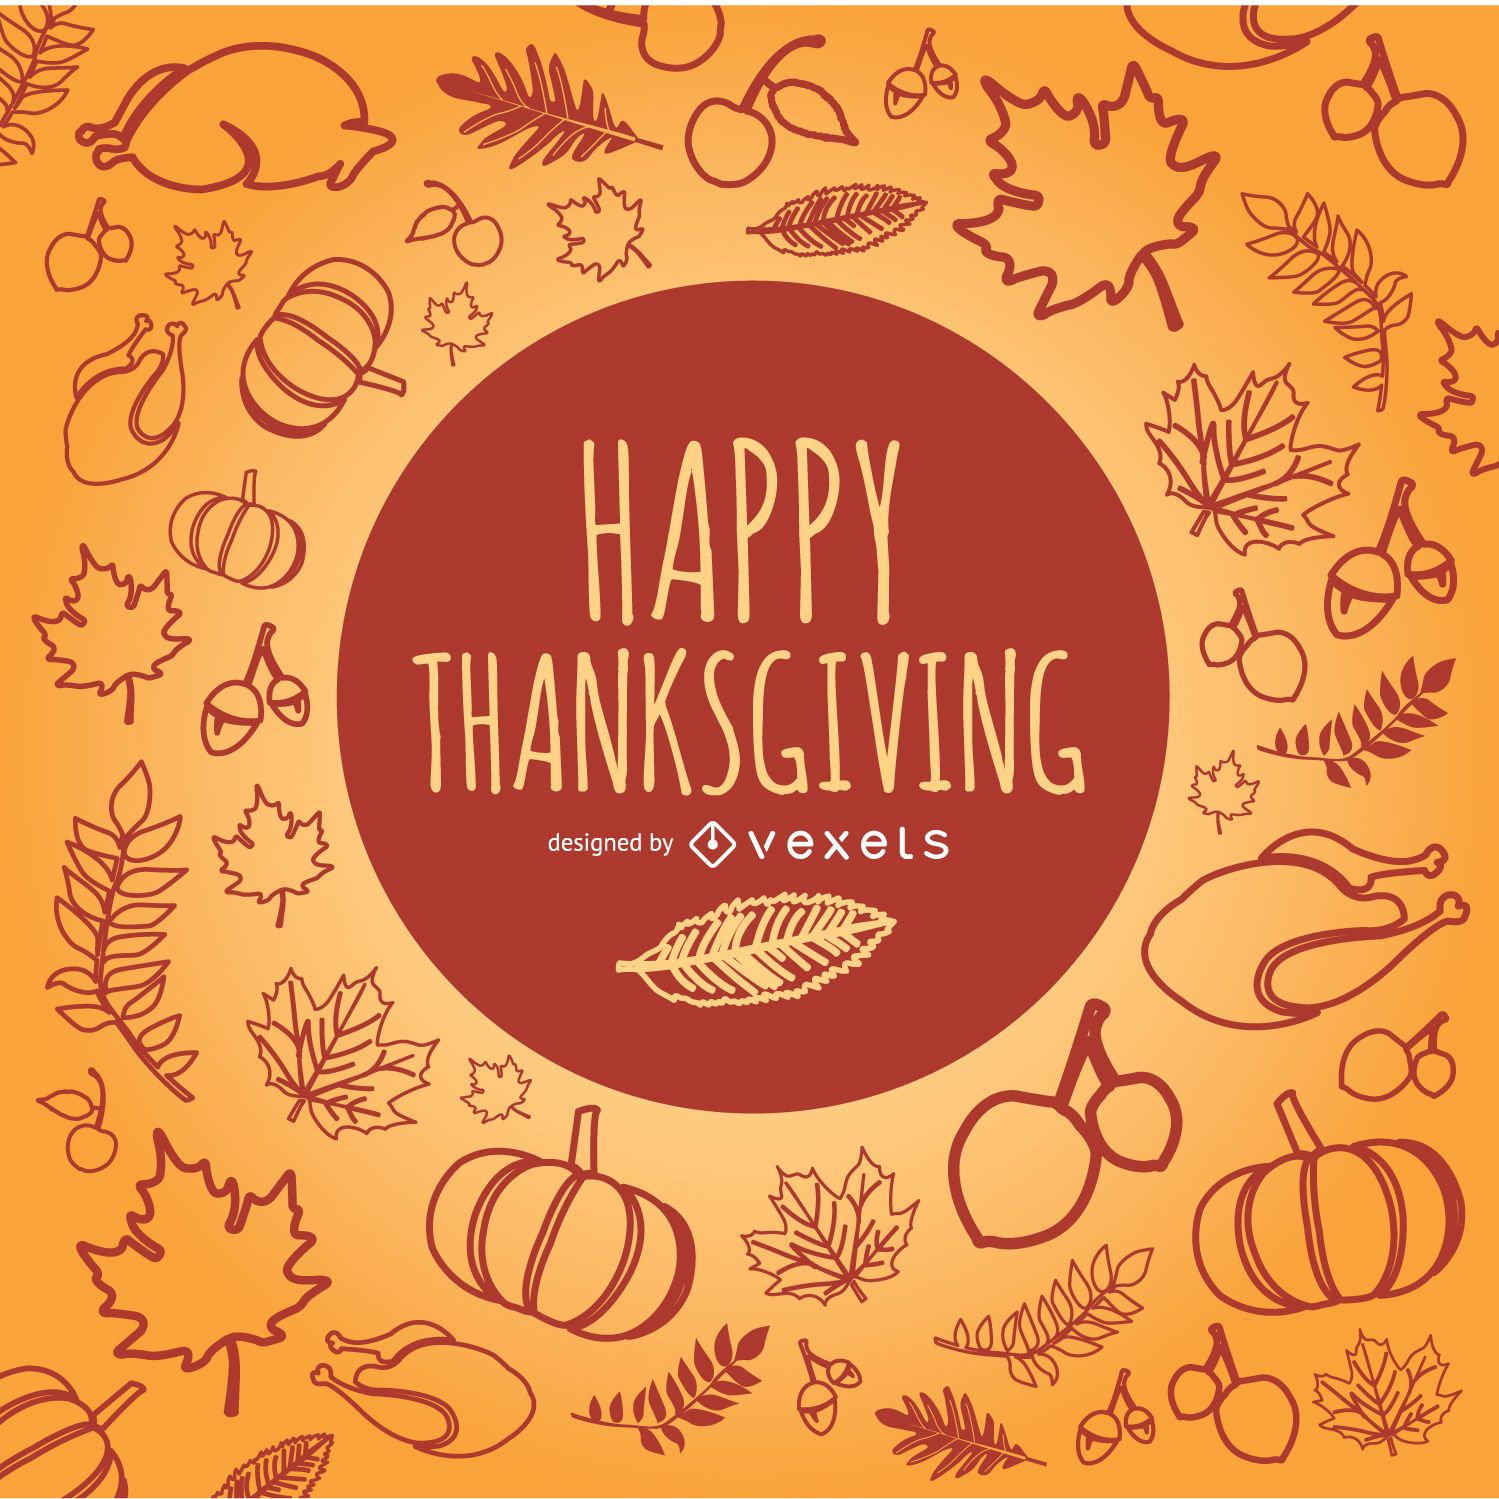 Garabatos de Feliz Acción de Gracias